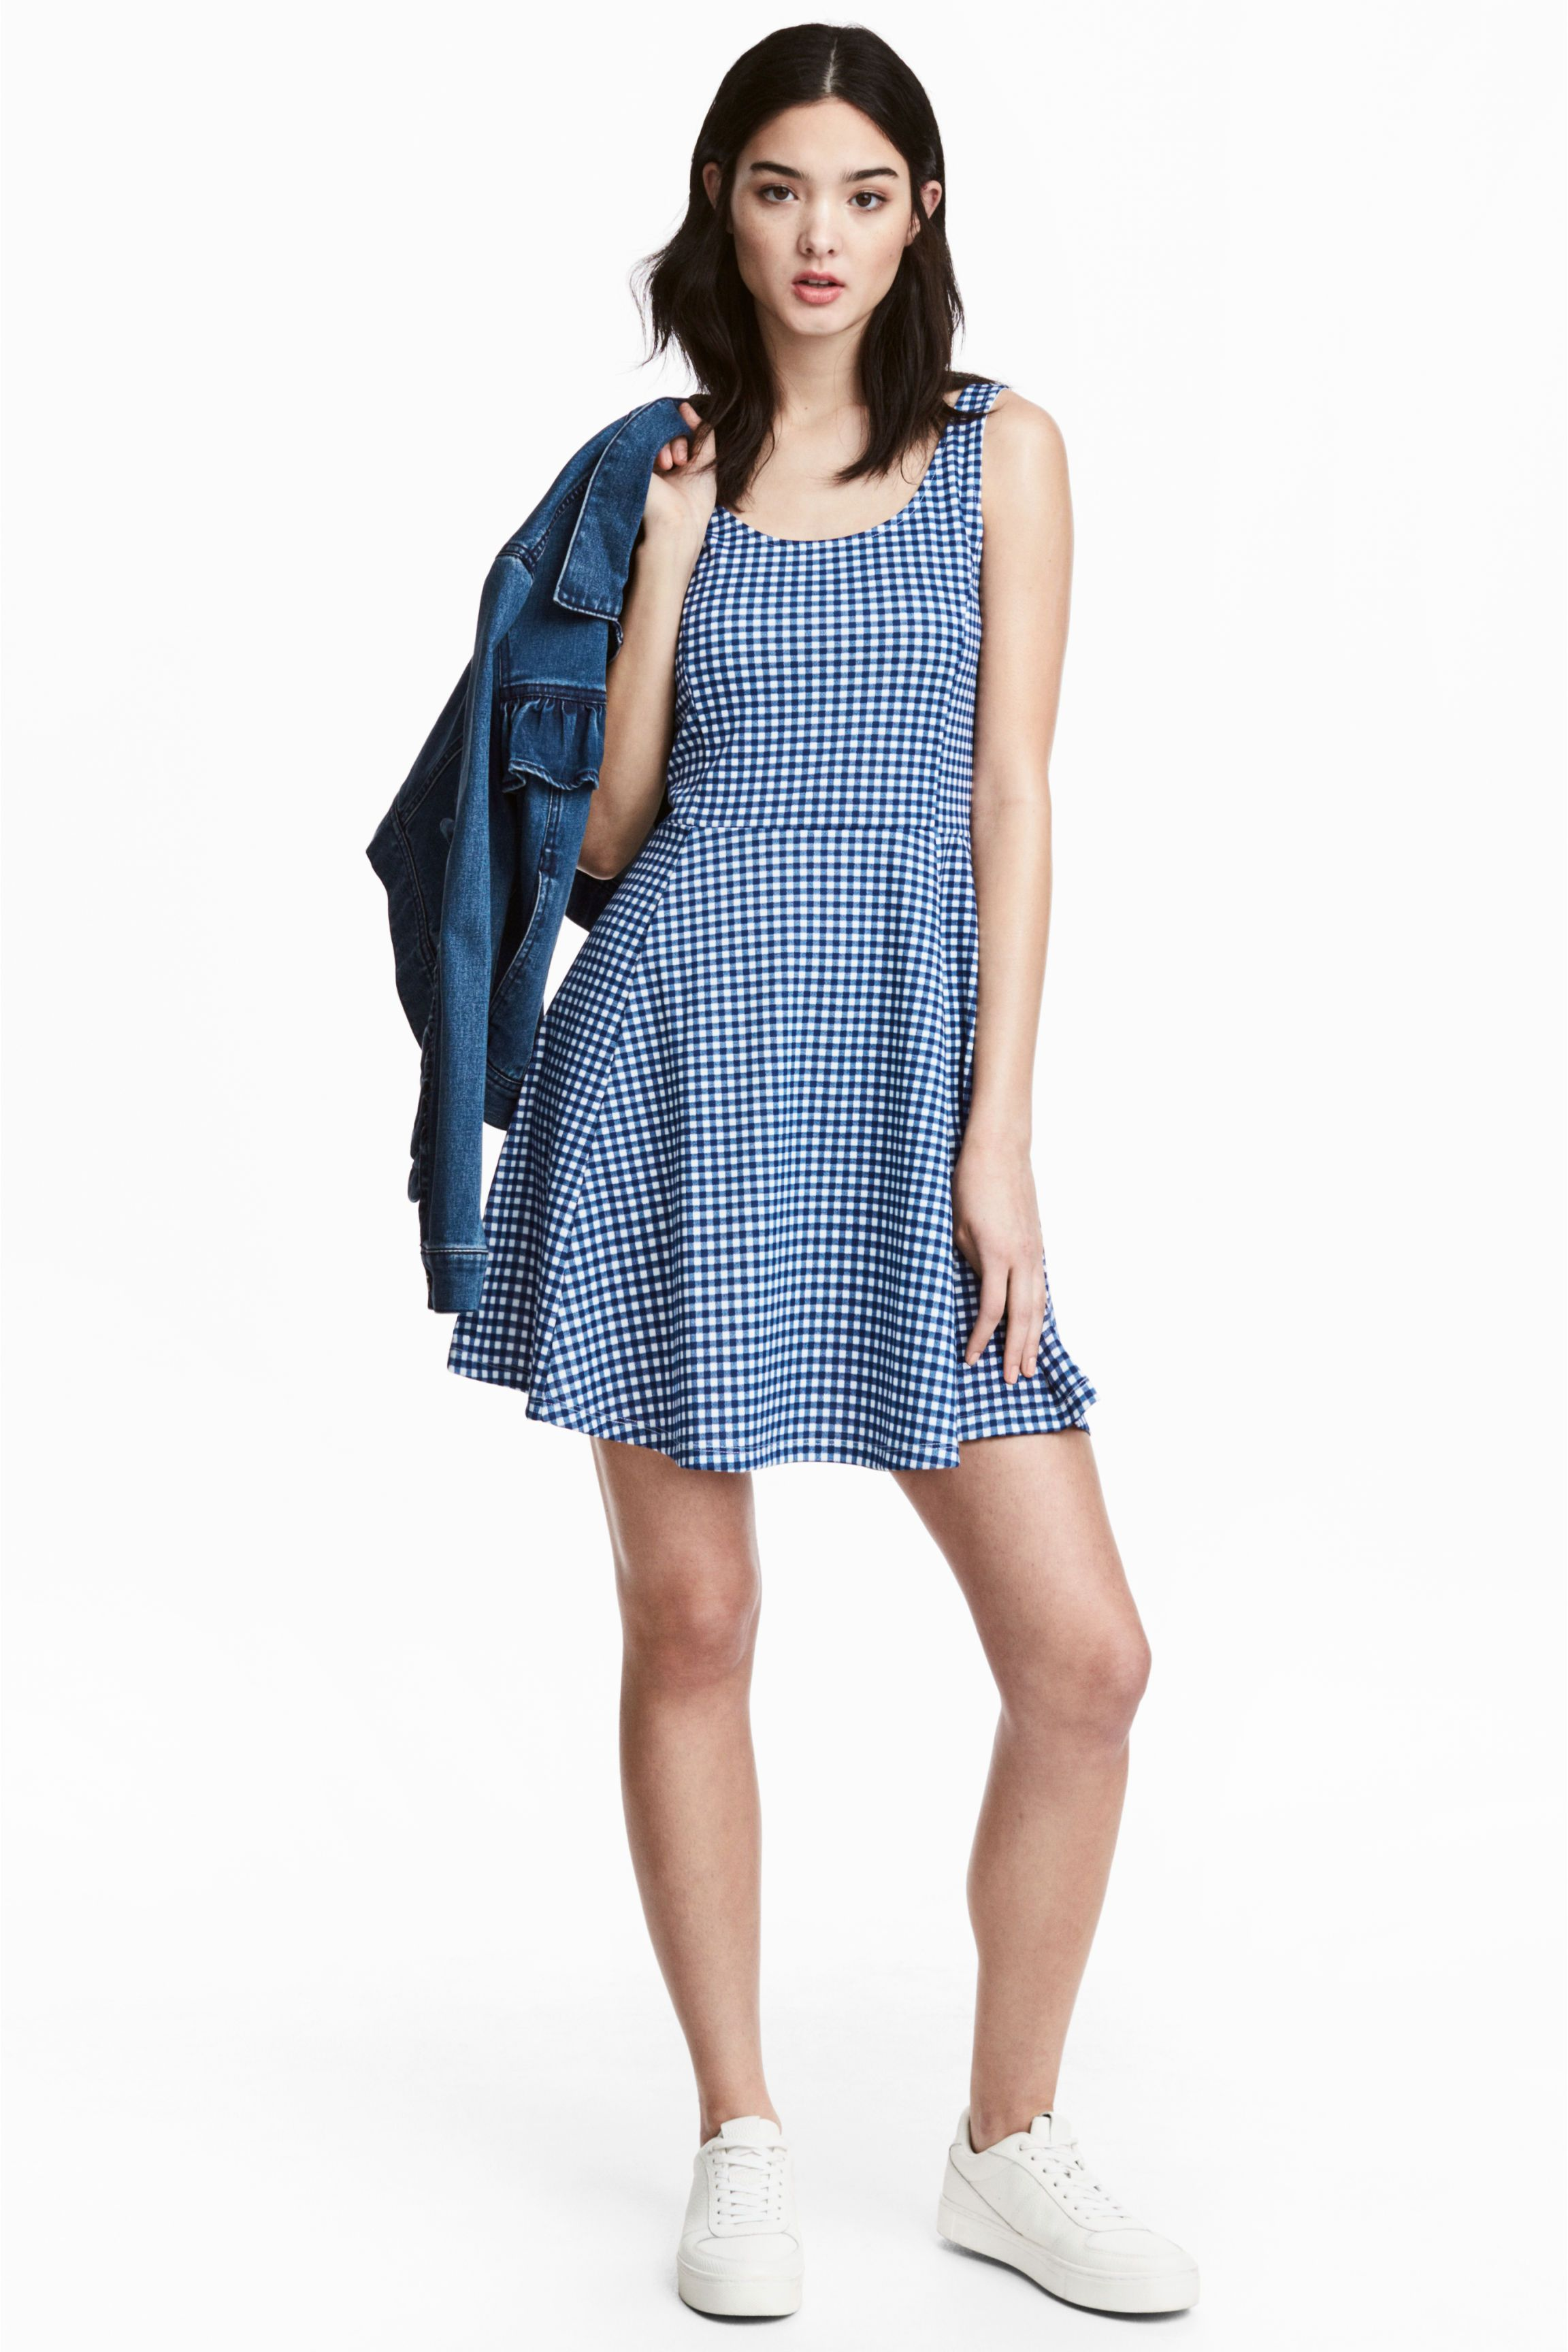 0e57aec93cc945 Tricot jurk - Blauw geruit - DAMES